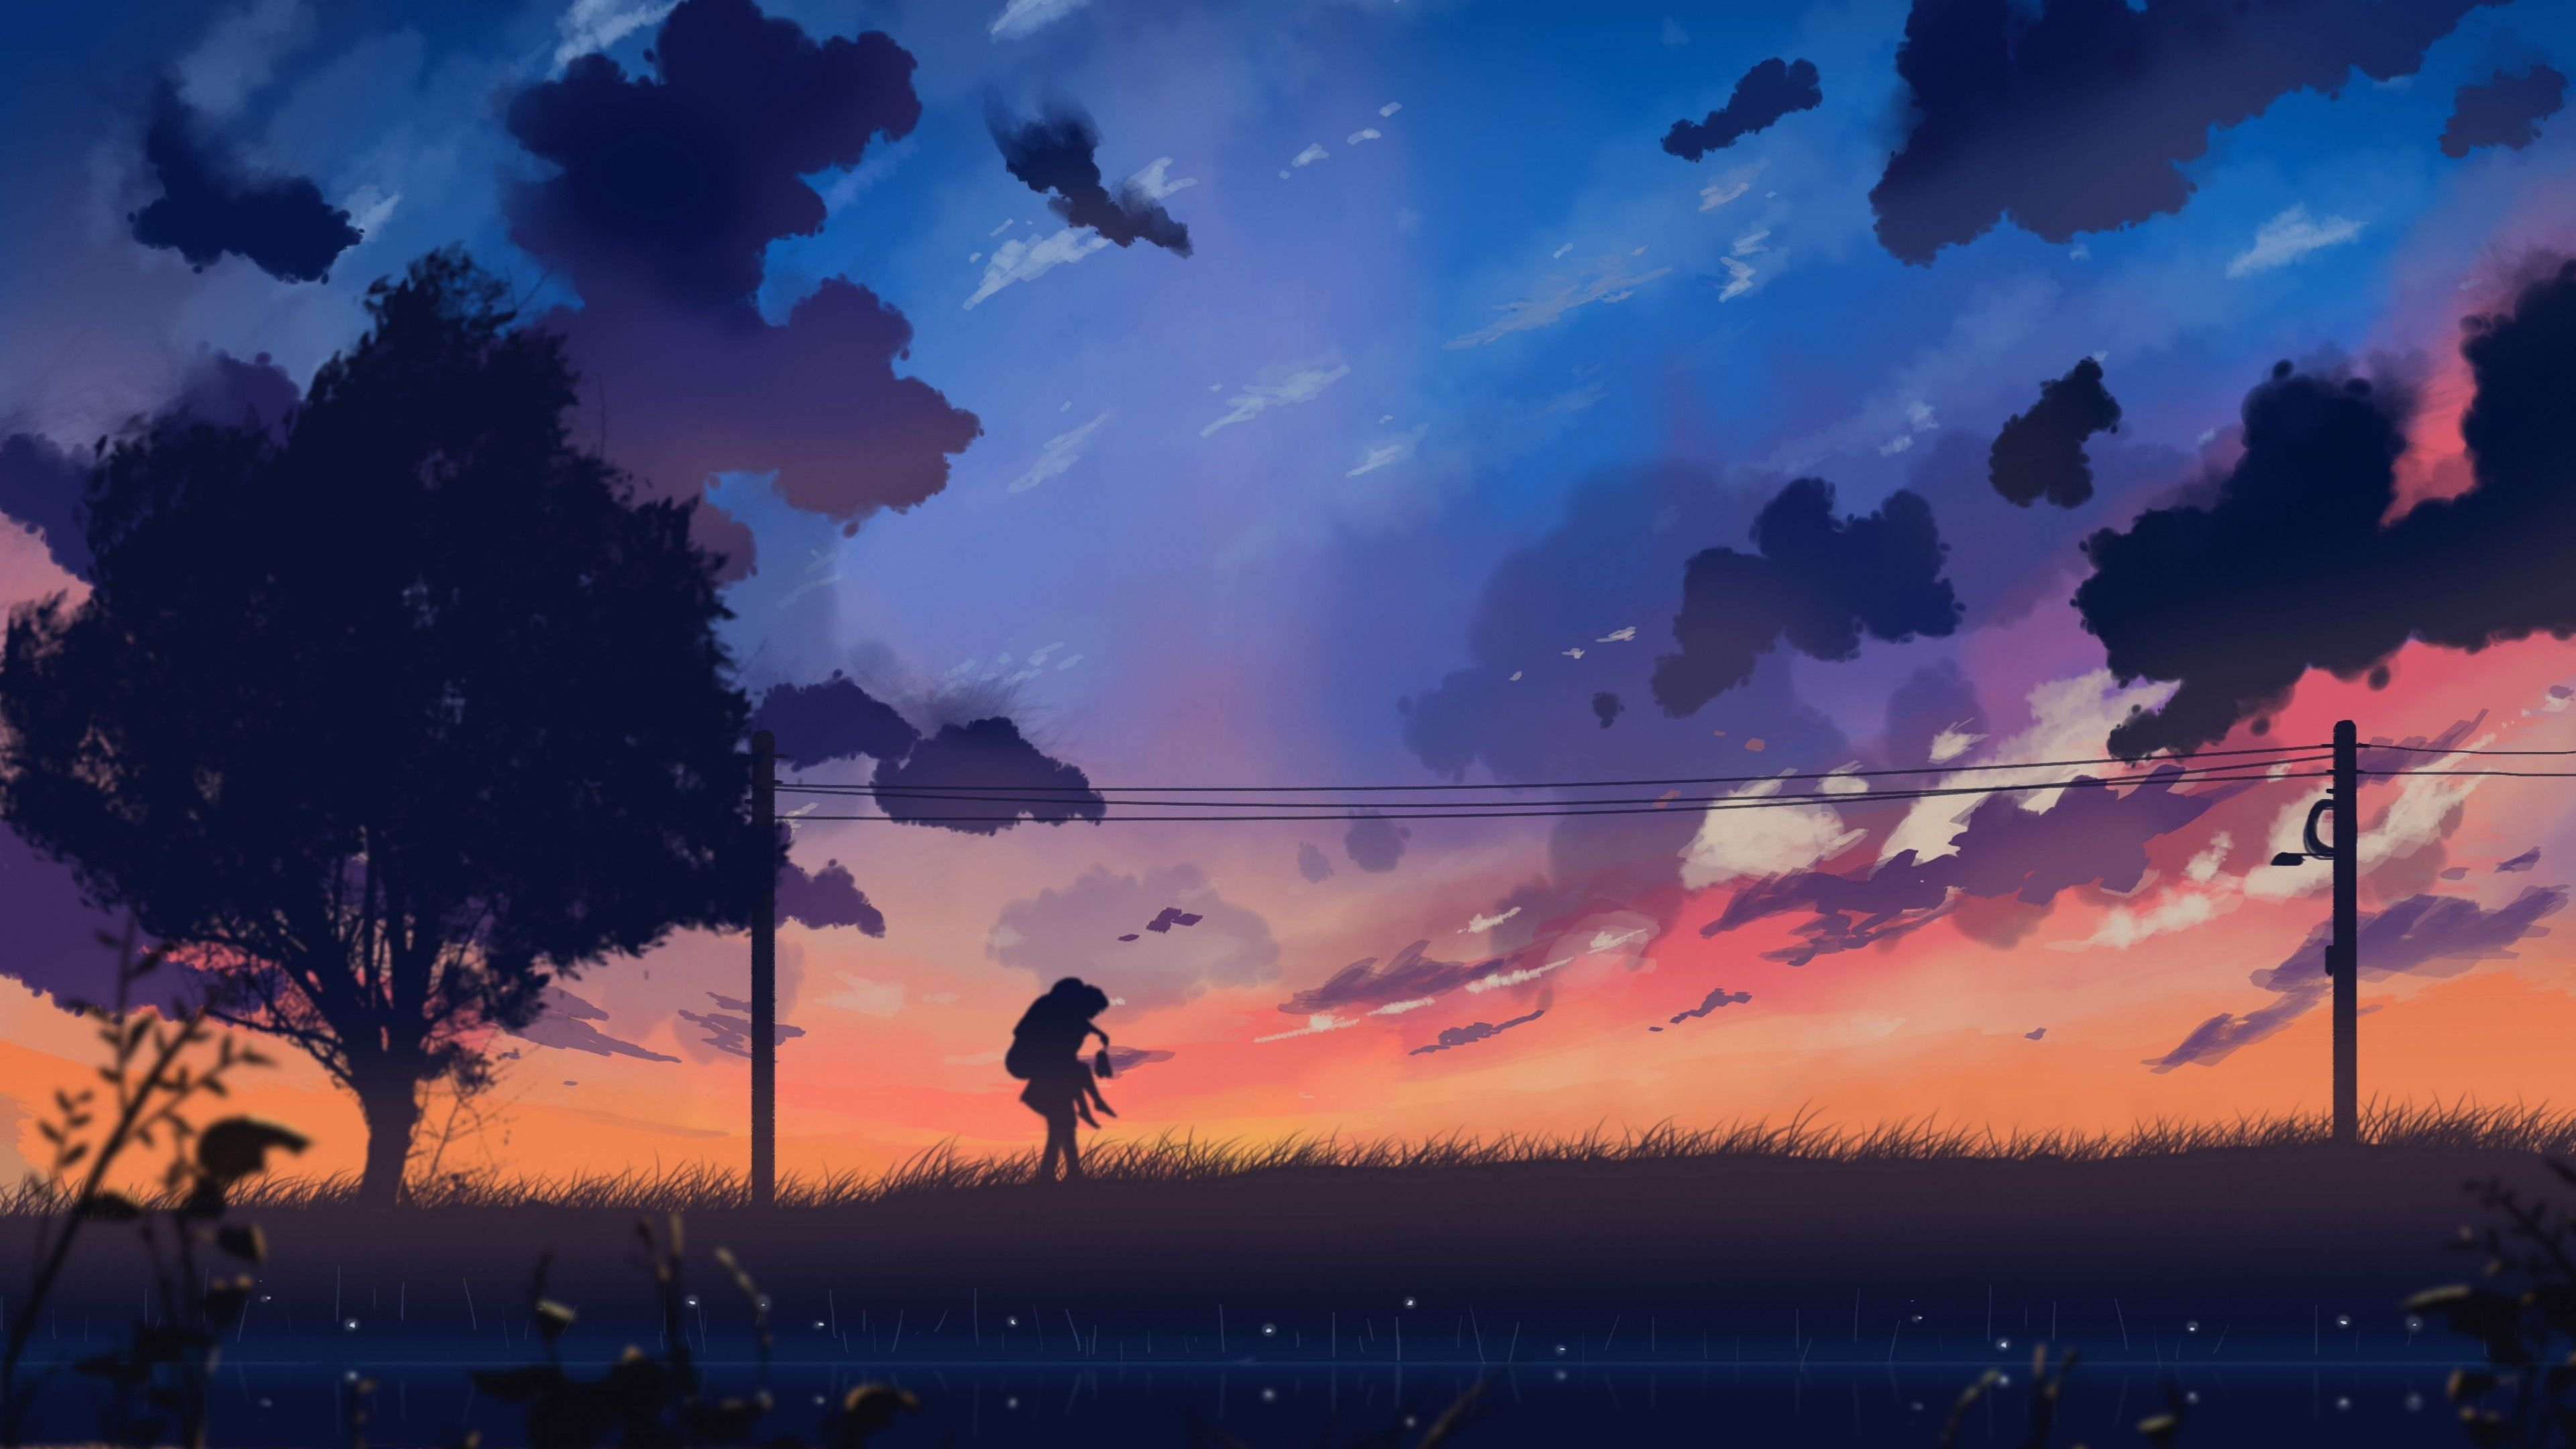 Boy Carrying Girl On His Shoulders Digital Art In 2021 Anime Scenery Anime Wallpaper Scenery Wallpaper Desktop wallpaper anime landscape